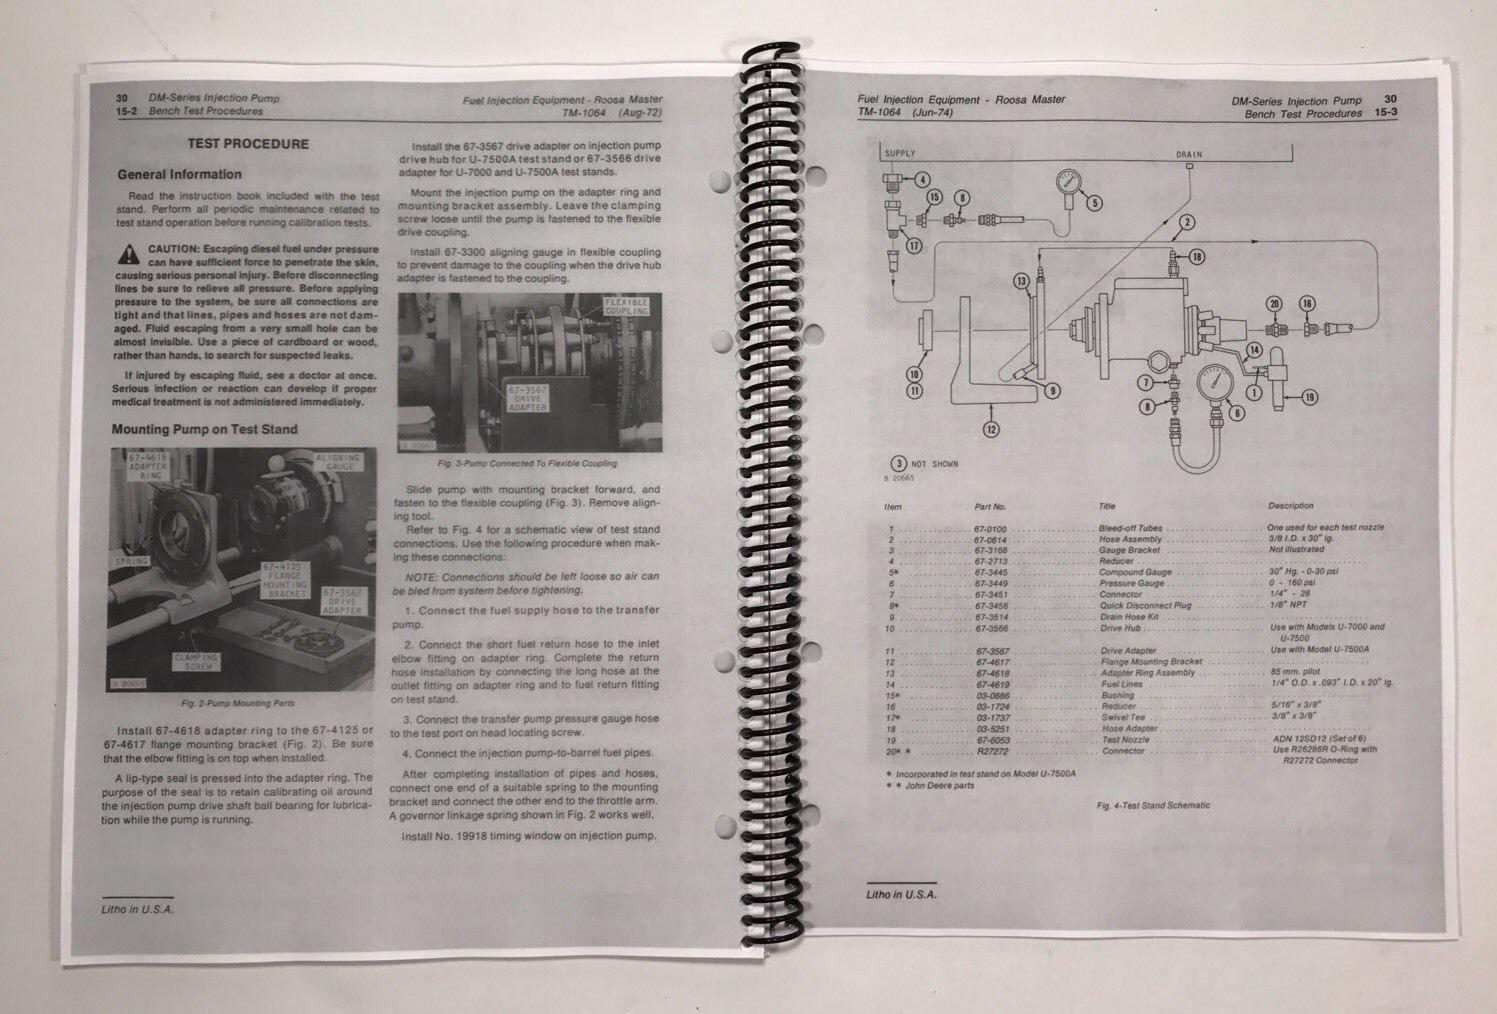 ROOSA MASTER FUEL INJECTION PUMP MANUAL JOHN DEERE Technical Service tests:  John Deere Manuals: 0766742552015: Amazon.com: Books